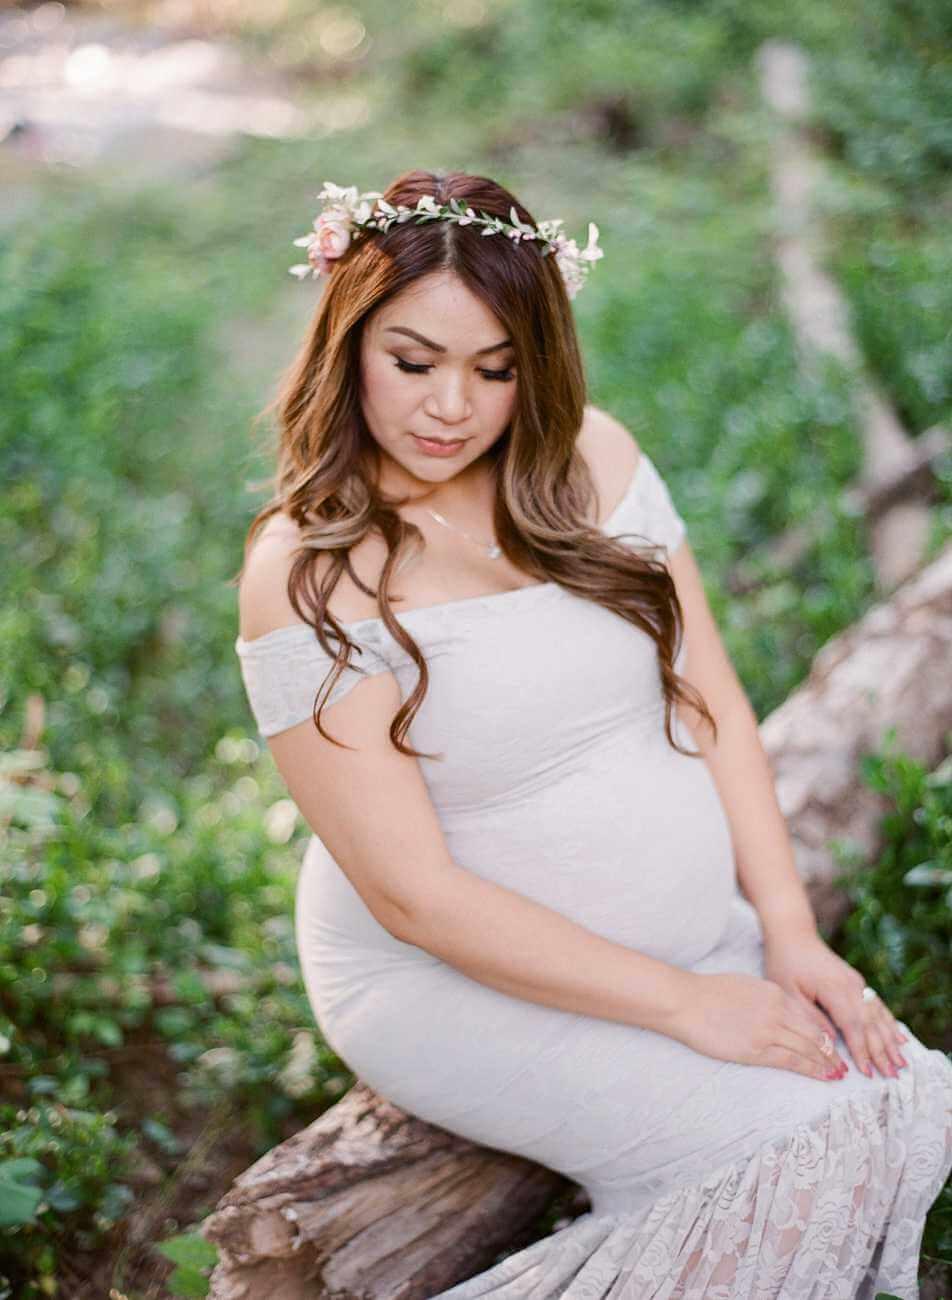 fresno-maternity-photographer-elisabeth-kate-studio_0203.jpg